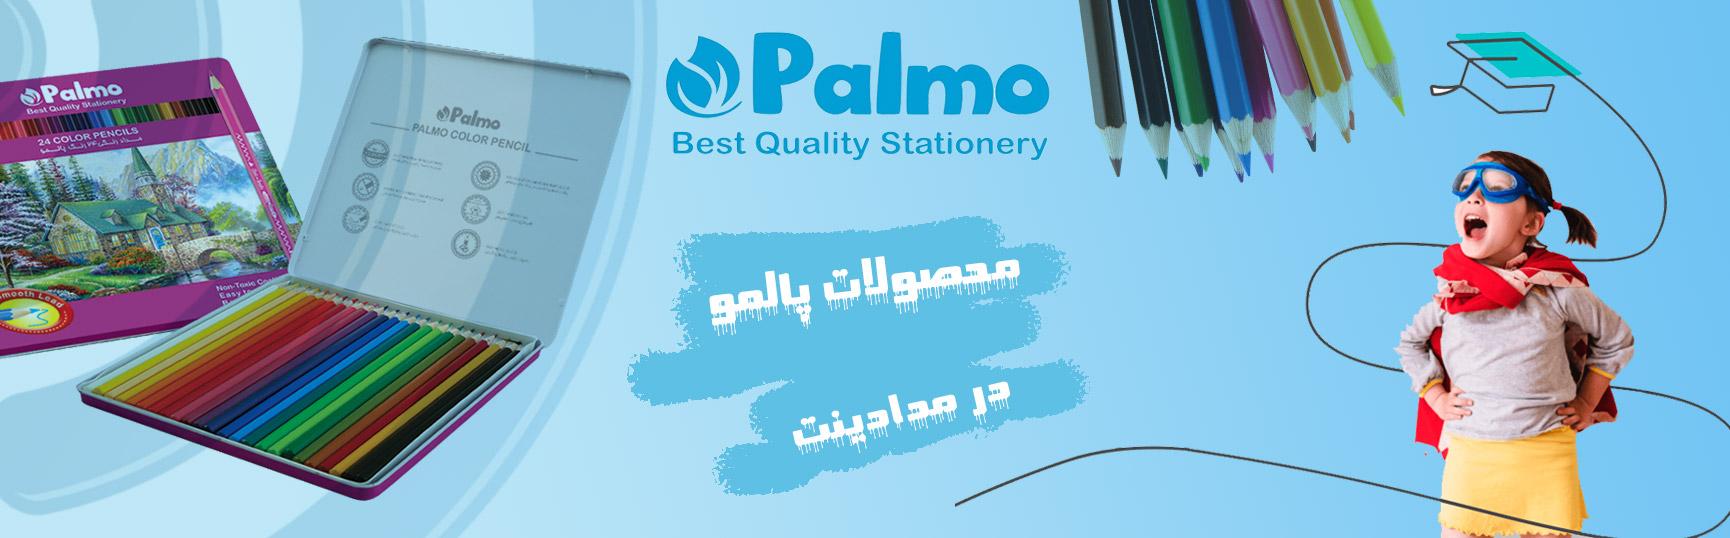 محصولات پالمو - مدادینت